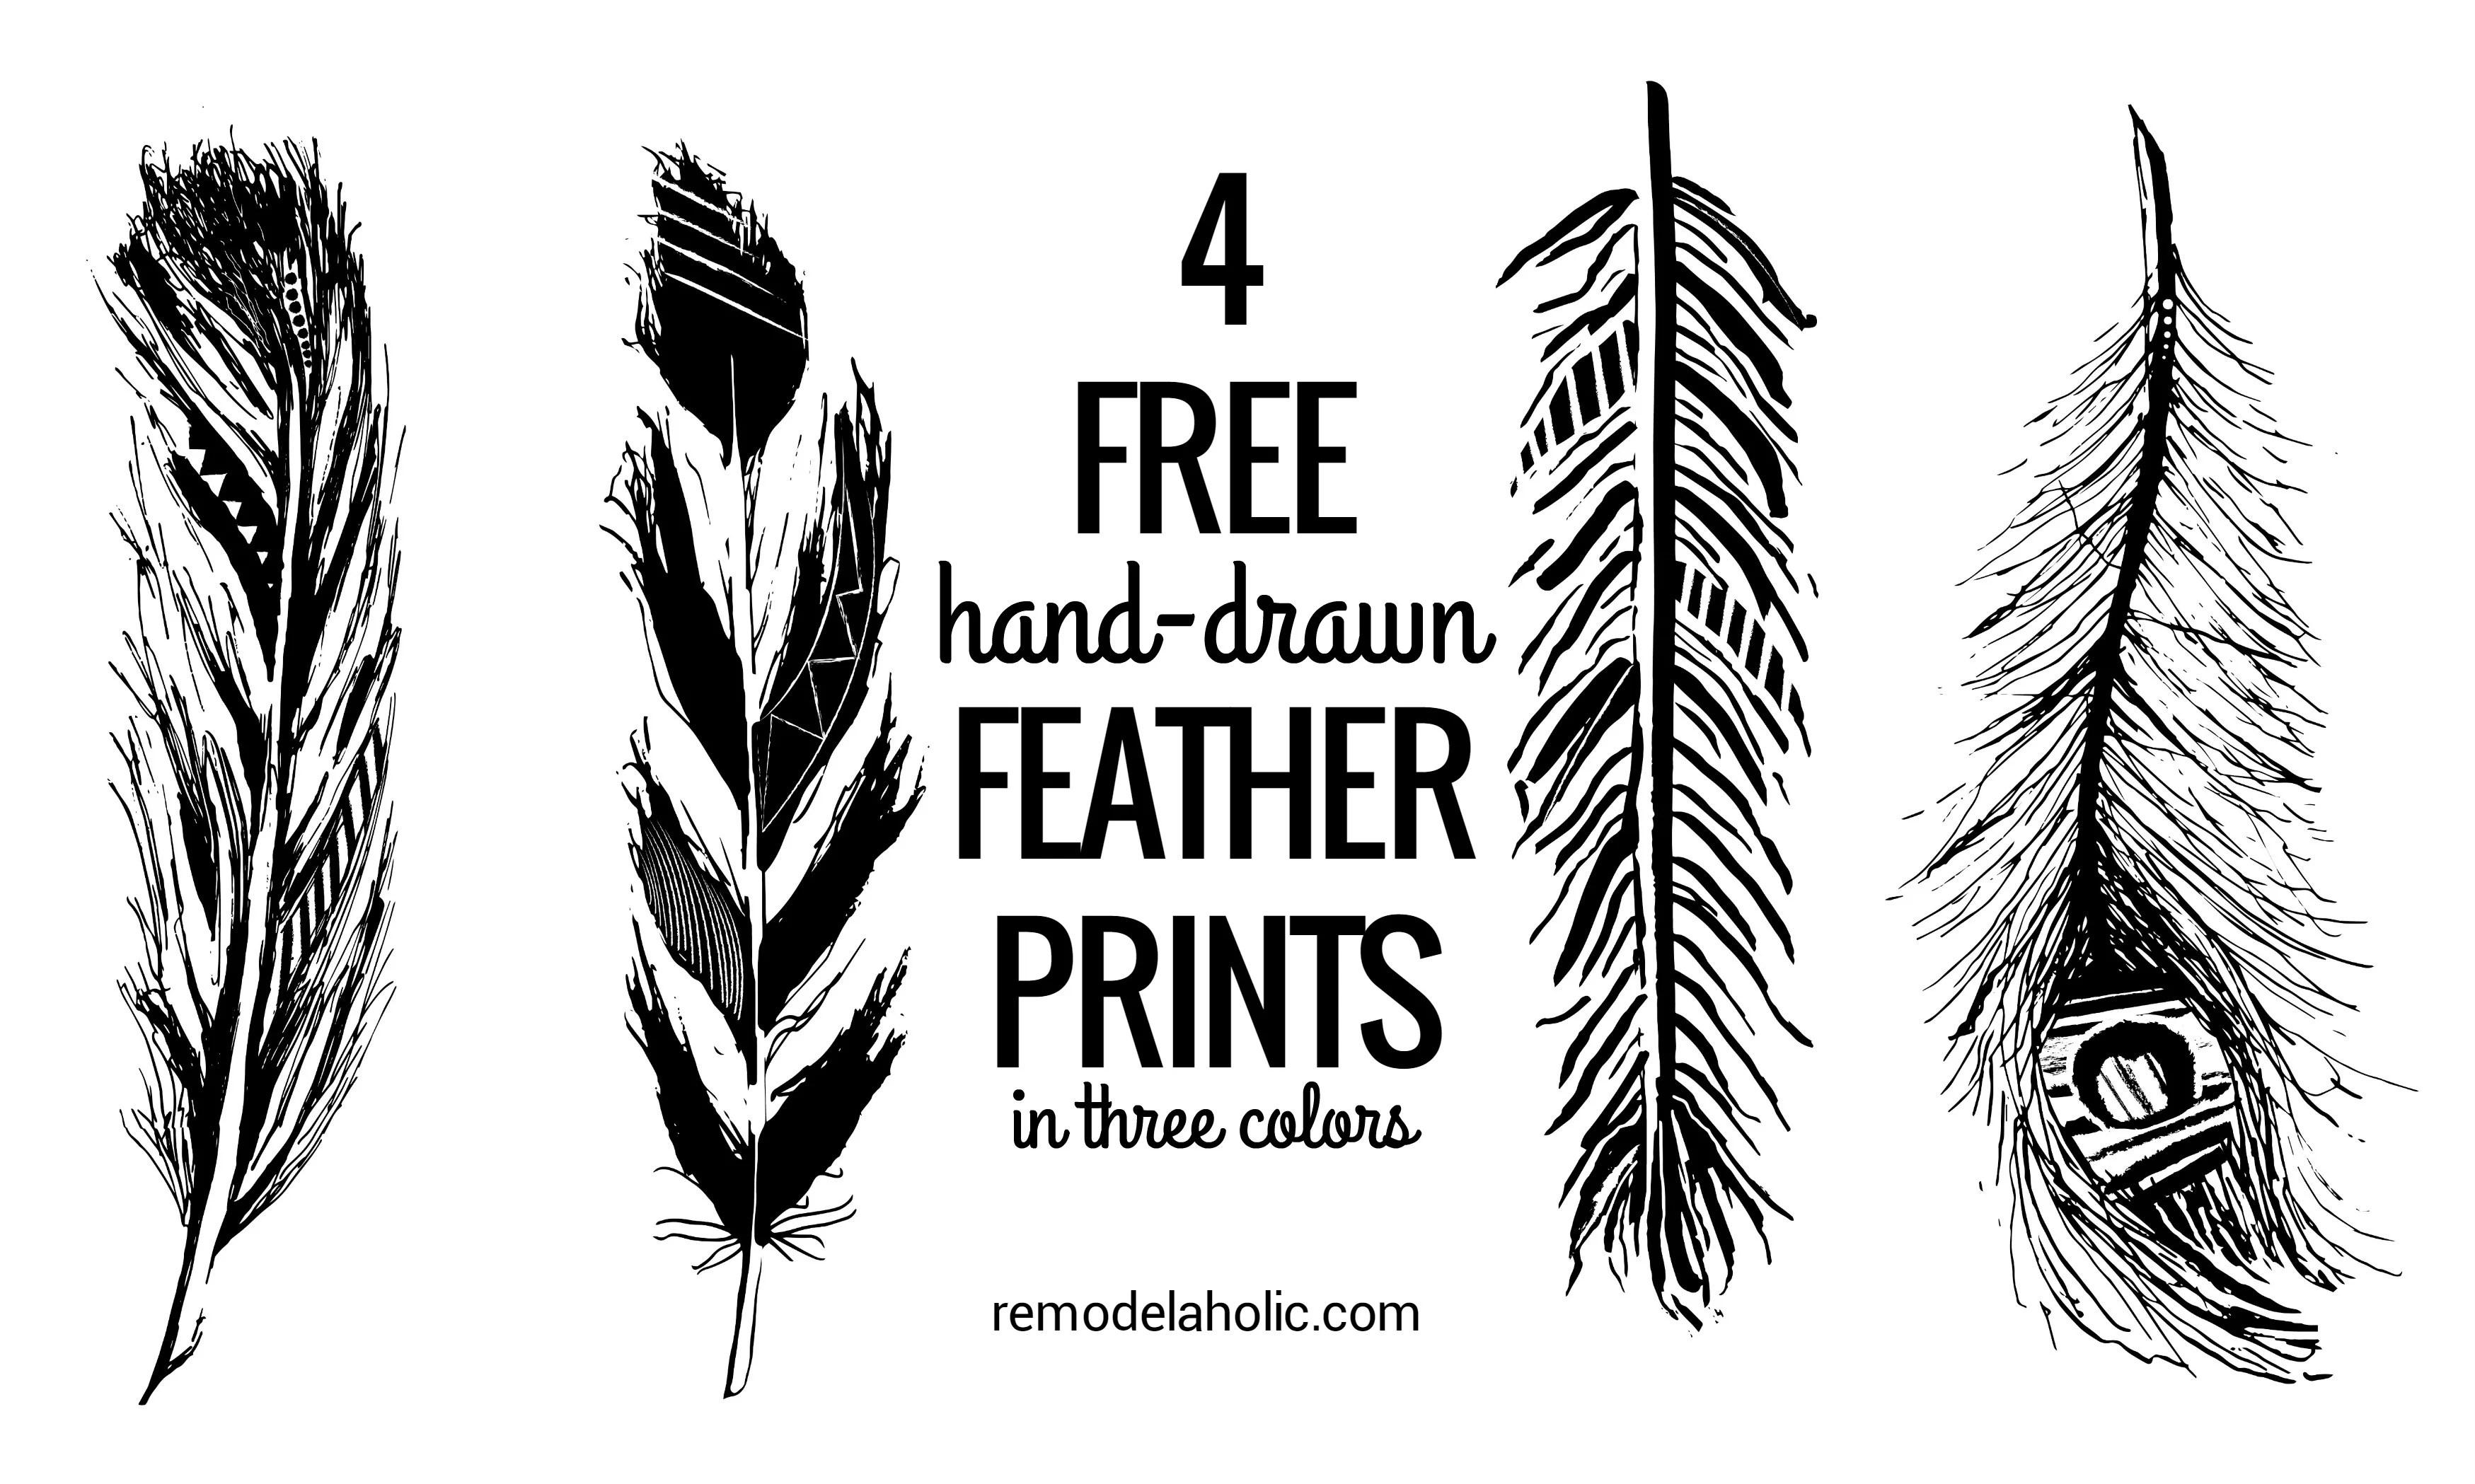 photo regarding Printable Feathers called Remodelaholic Feather Printables